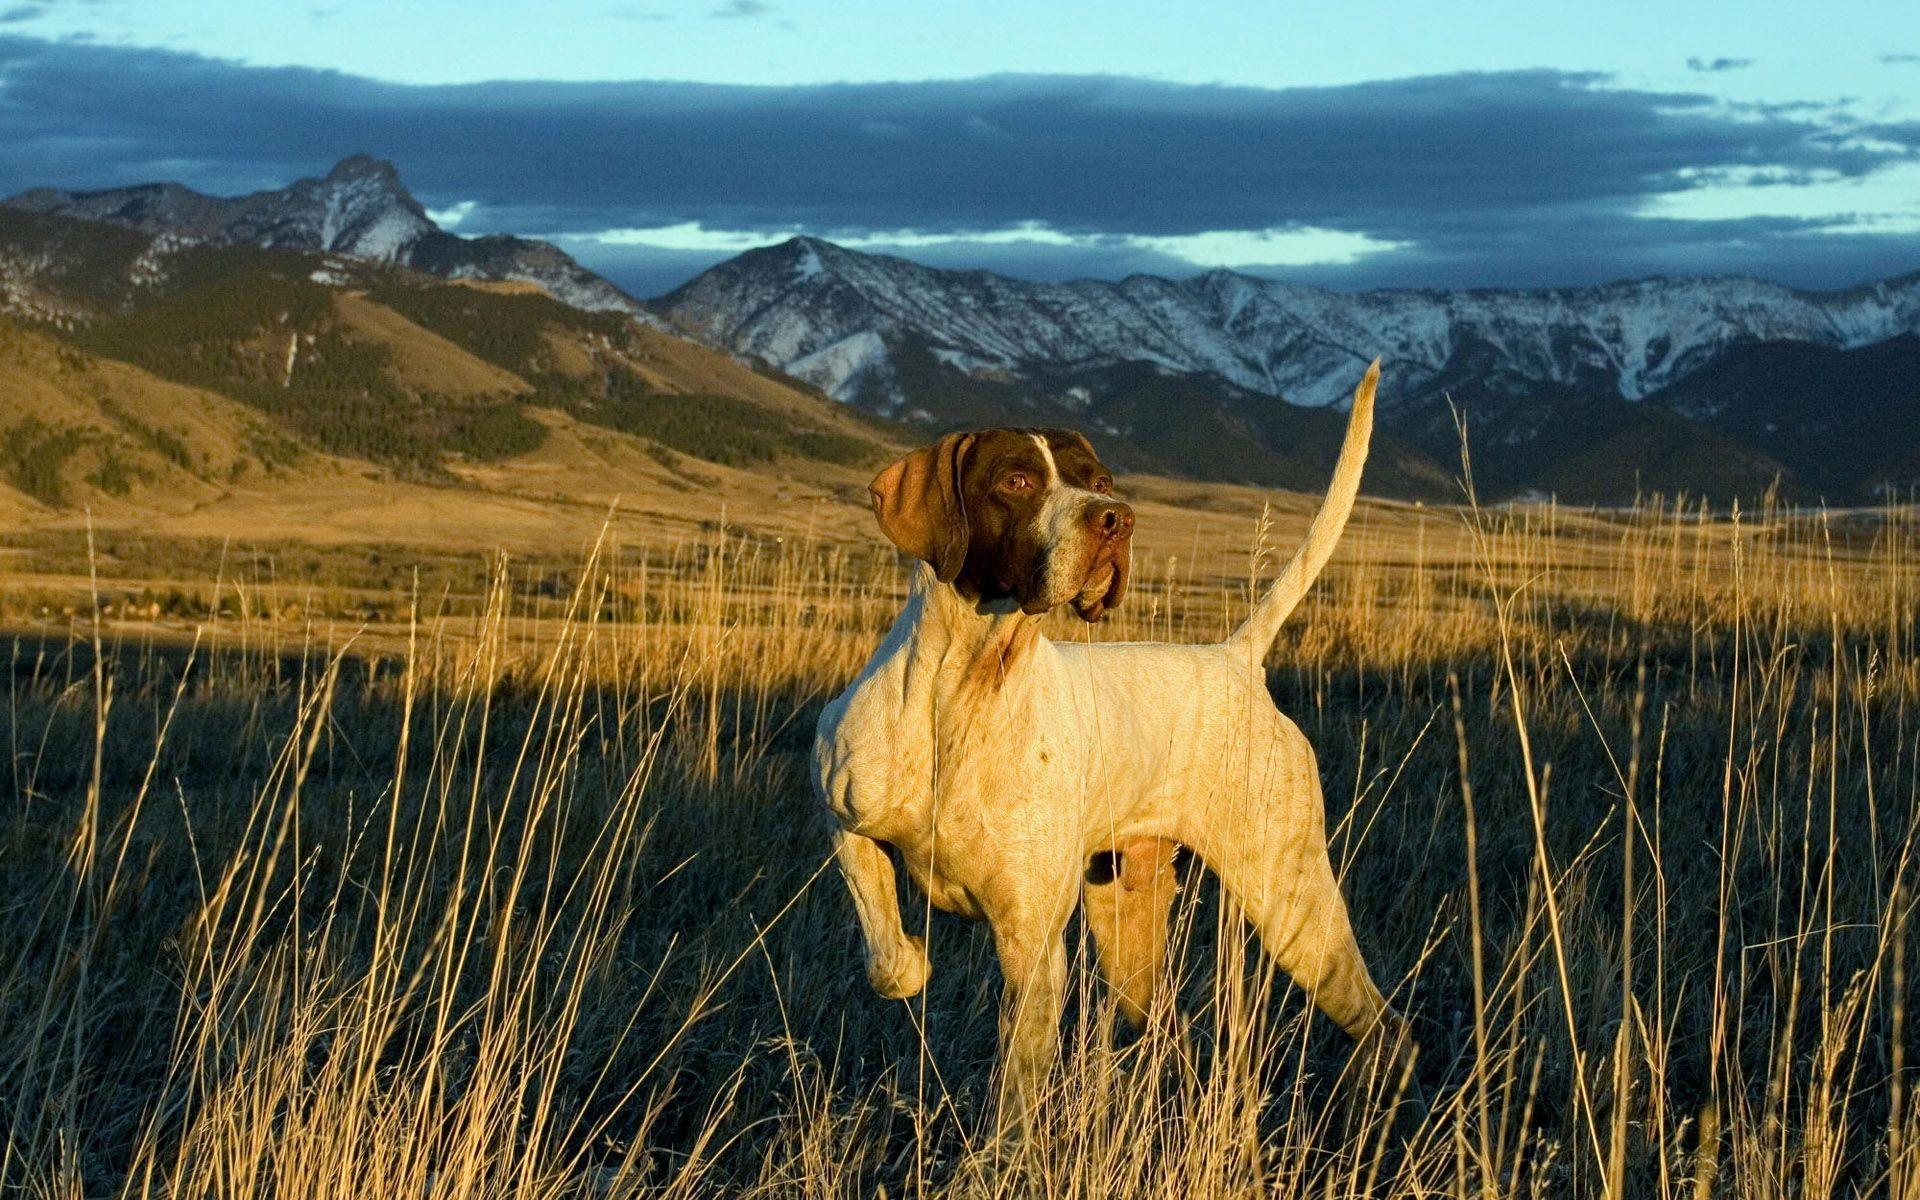 Hunting Dog Wallpaper Hd - HD Wallpaper